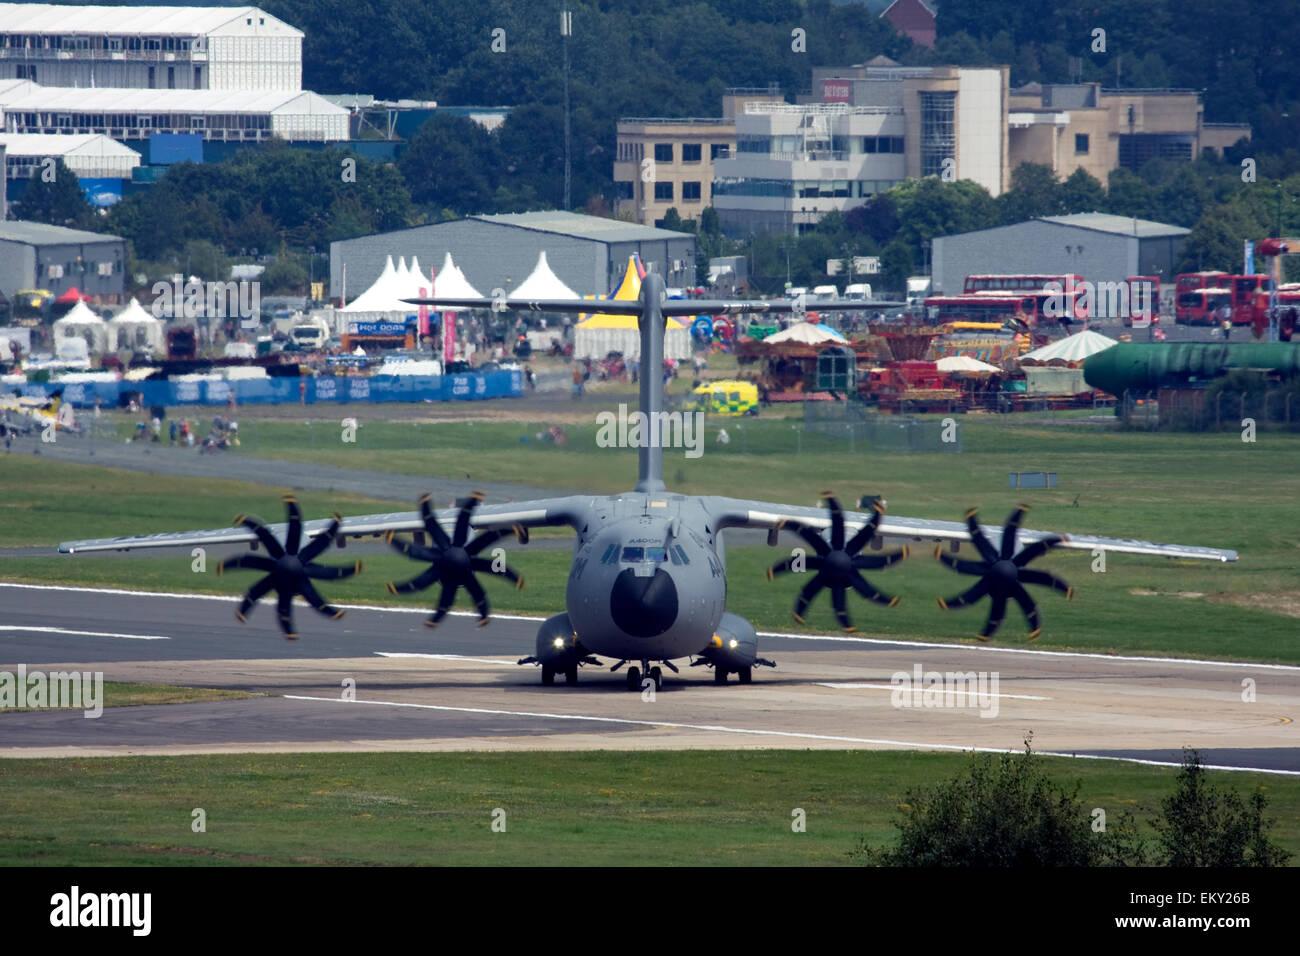 Airbus A400M Atlas military transport aircraft at Farnborough International Airshow 2014, UK - Stock Image